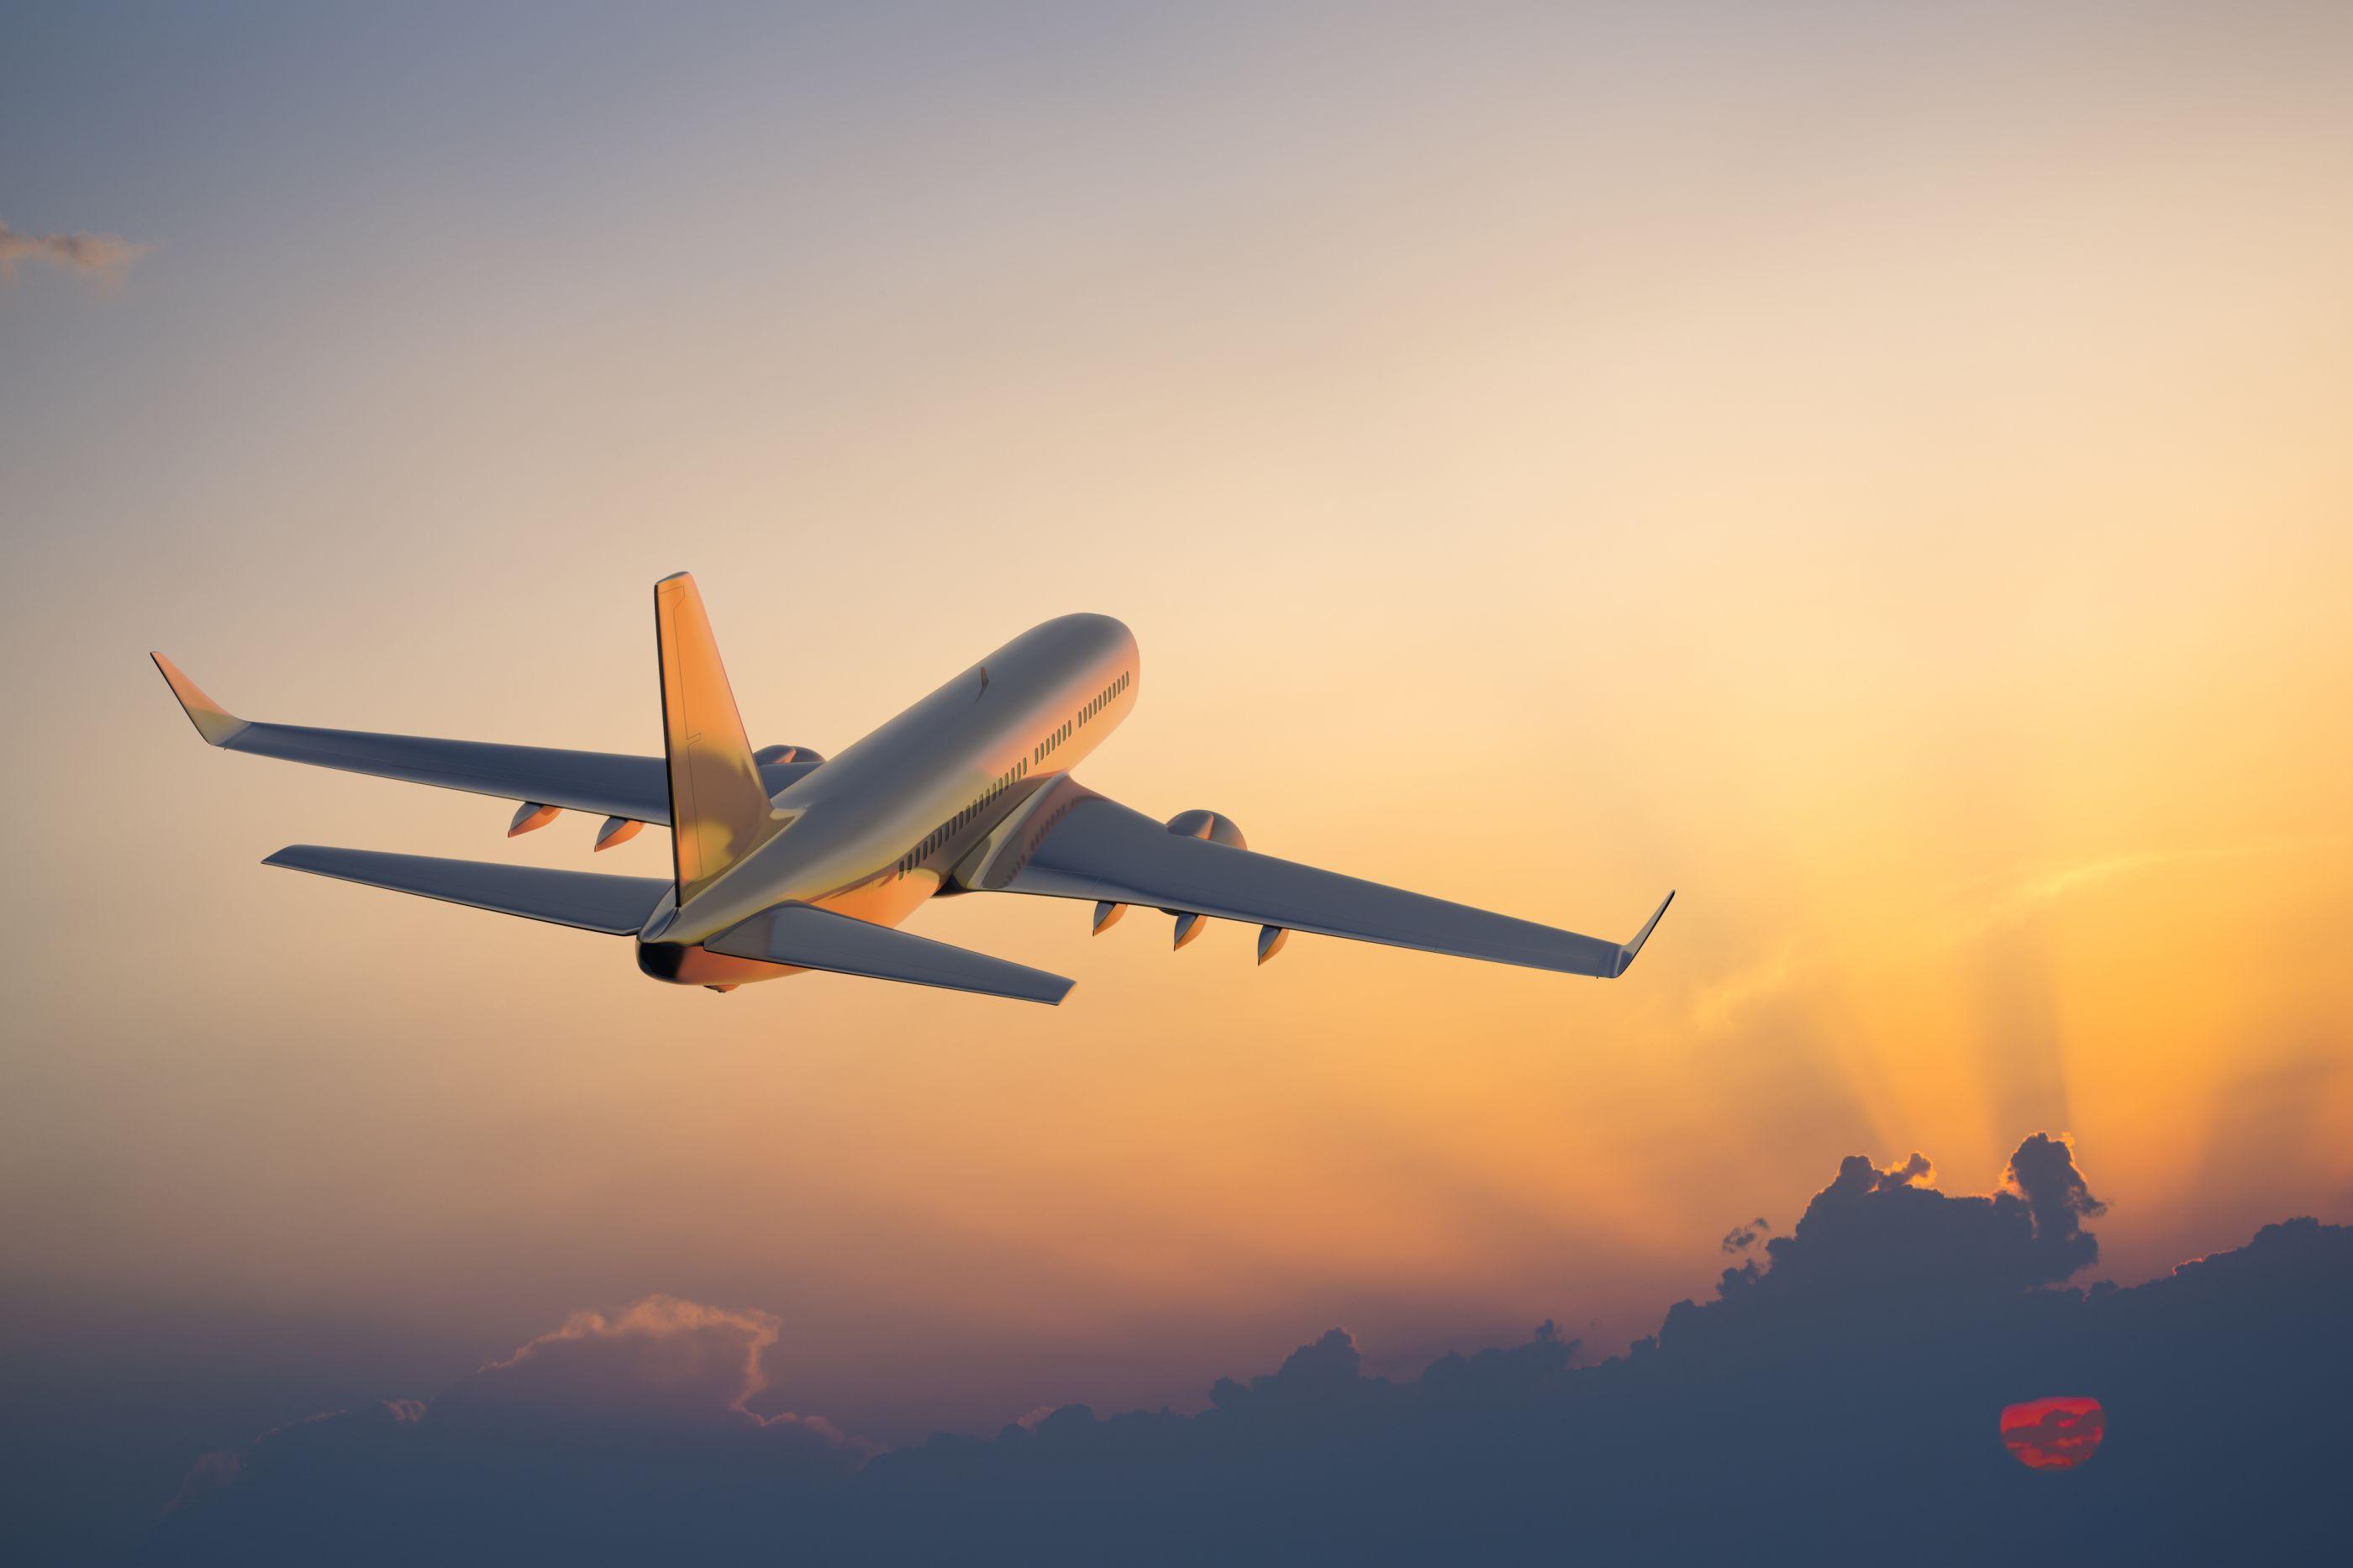 Anac anuncia encerramento de postos presenciais em aeroportos brasileiros